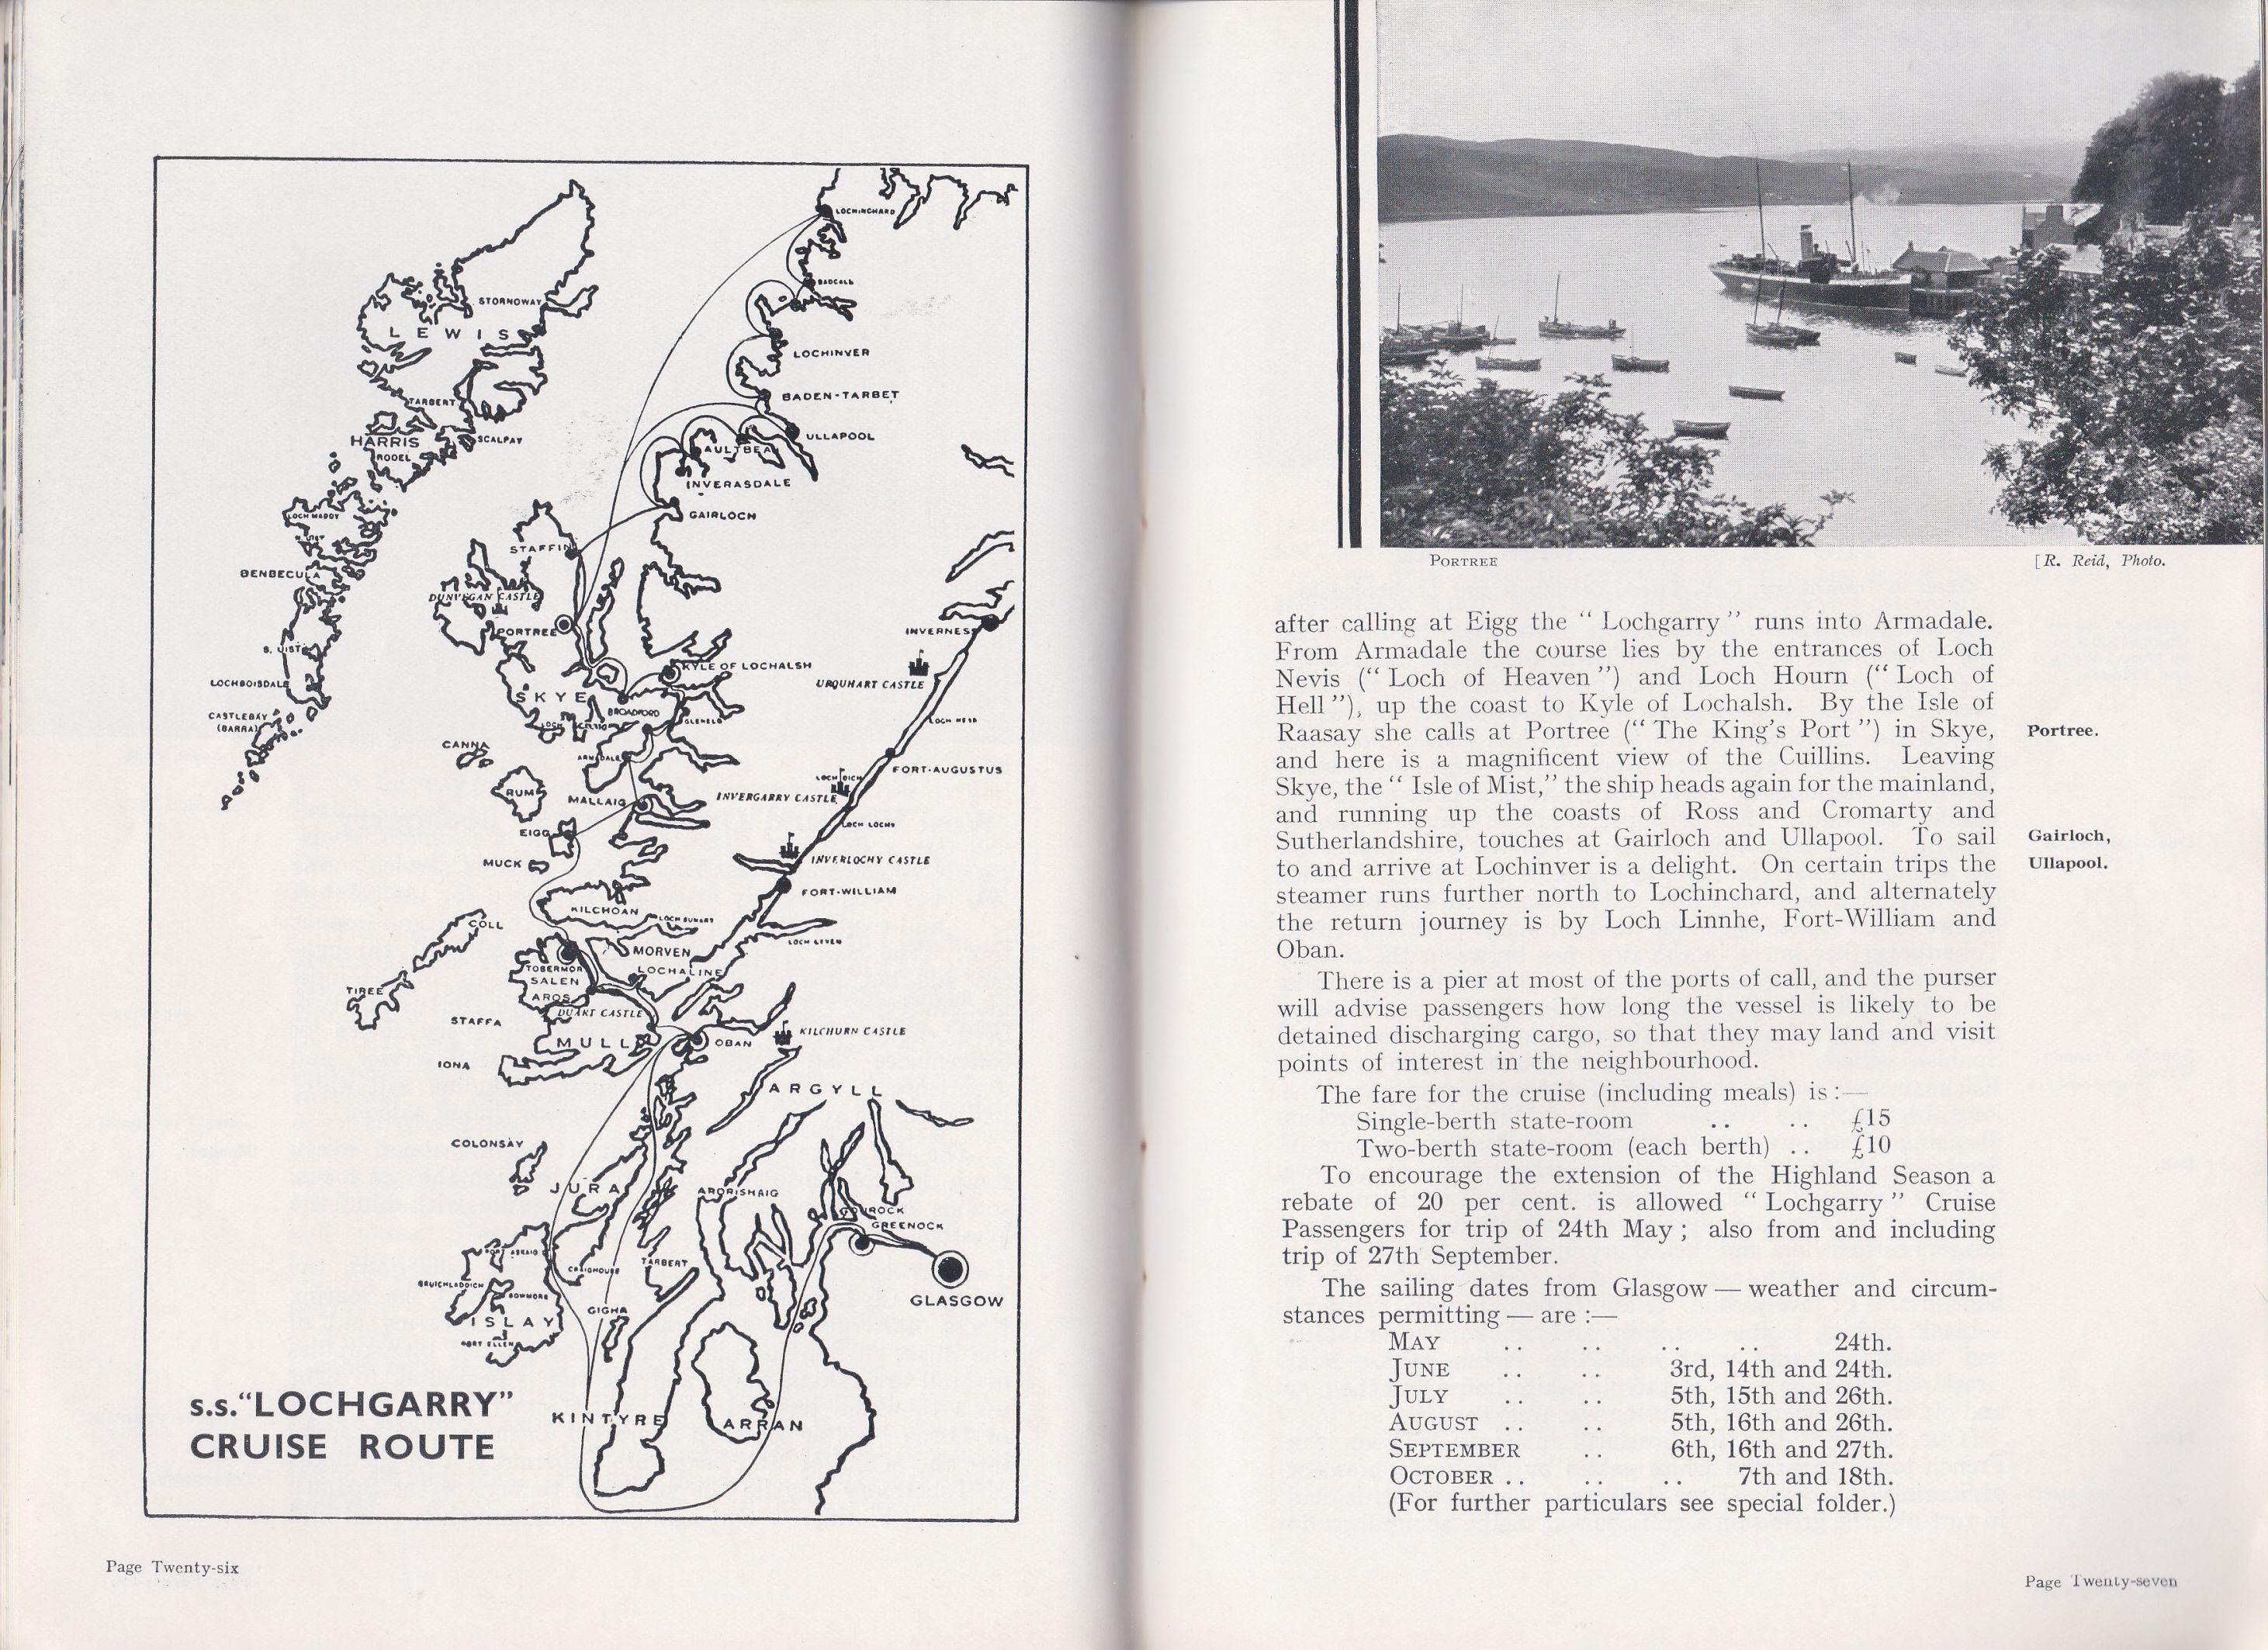 1937 timetable detail